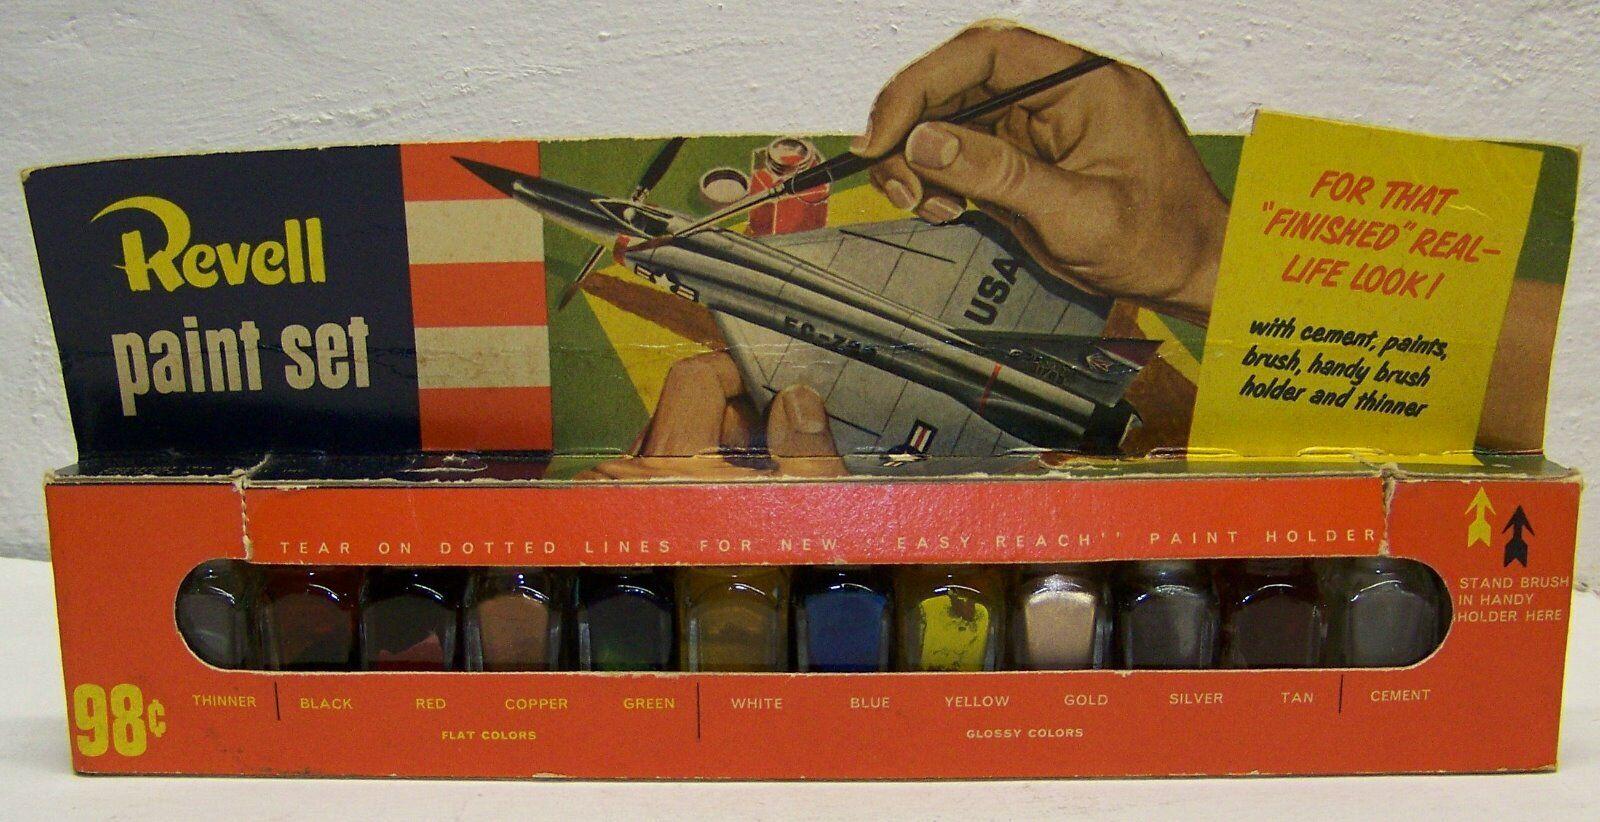 Rare Revell 1956 paint set for model kits